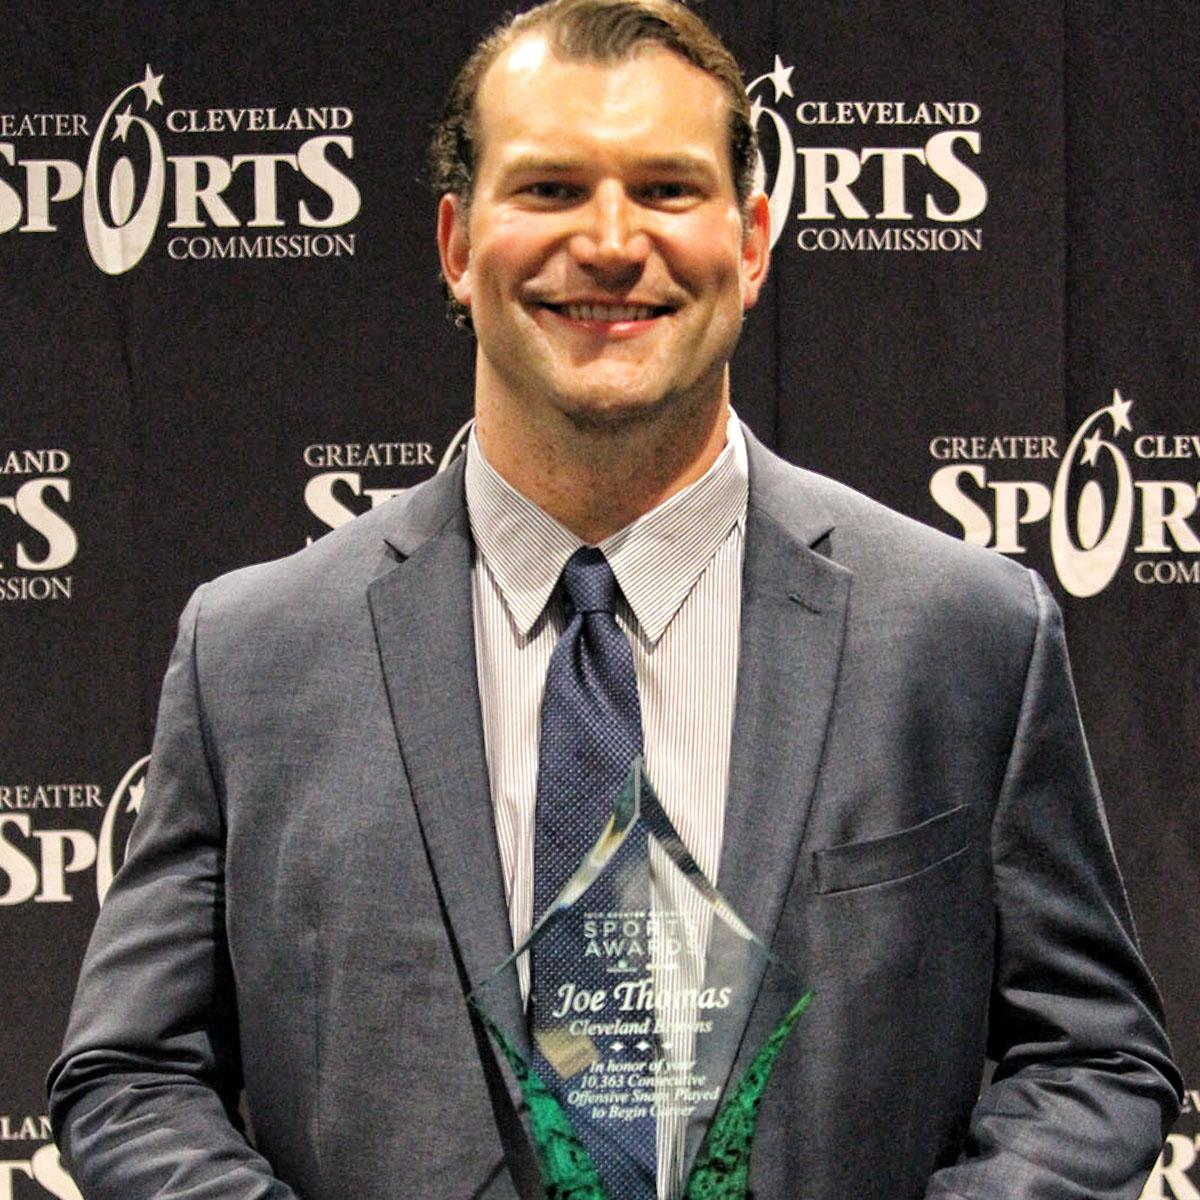 .@joethomas73 honored for snap streak milestone at Greater Cleveland Sports Awards  📰 » https://t.co/tOBwqMr3gb https://t.co/k8Pmyjk7CO